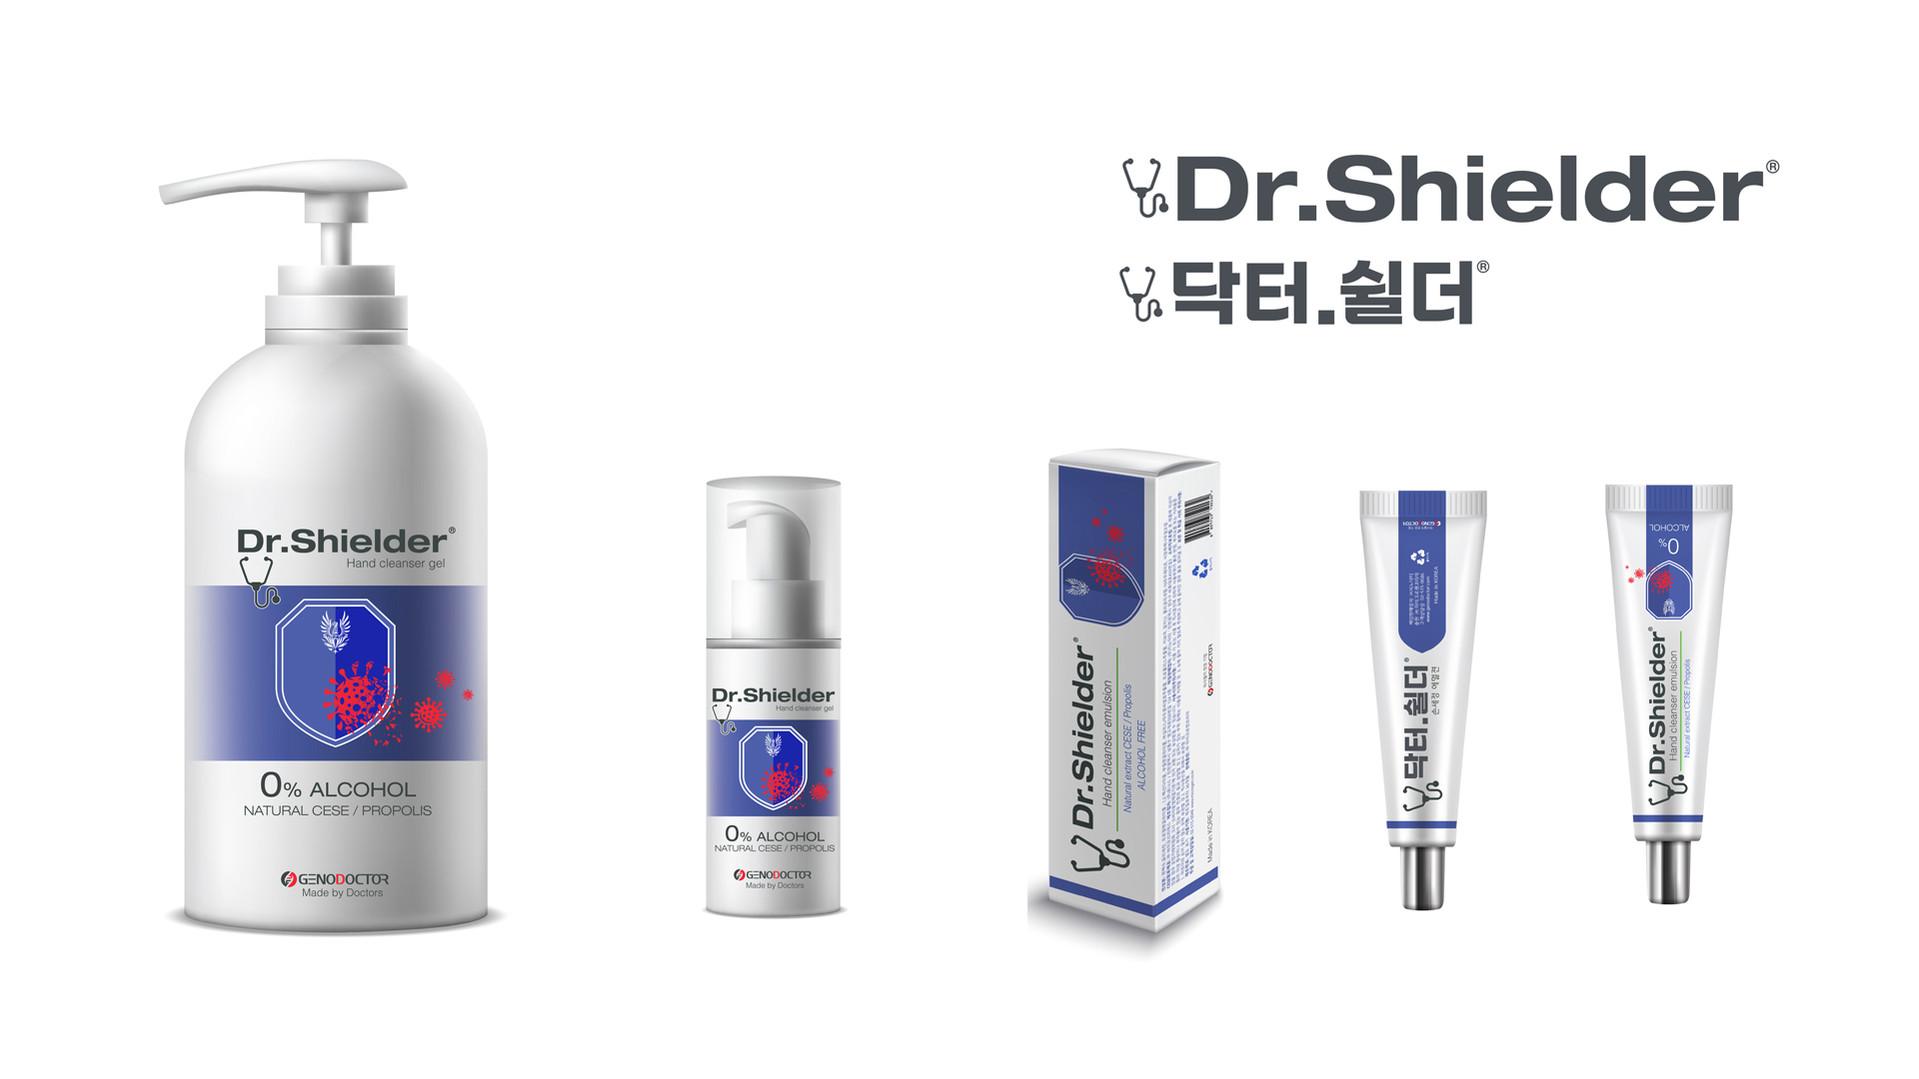 Dr.Shielder - Genodoctor